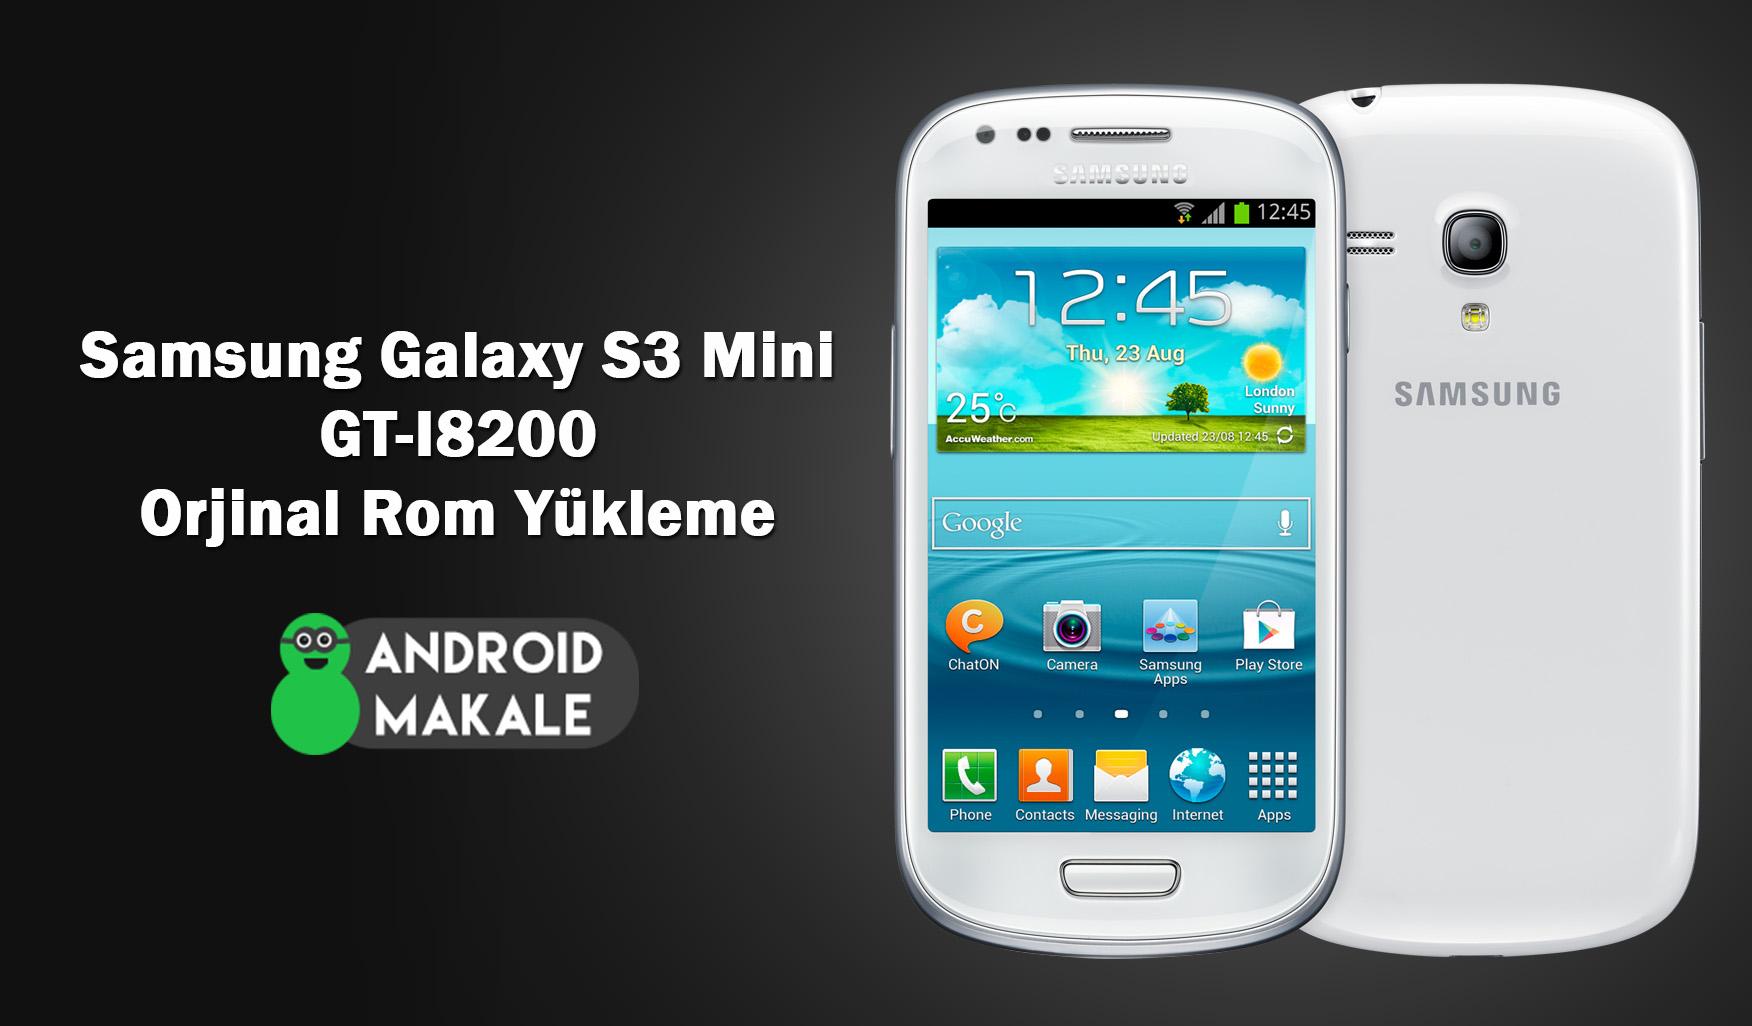 Samsung Galaxy S3 Mini (GT-I8200) Android 4.2.2 Orjinal Rom Yükleme s3 mini i8200 stock rom indir s3 mini i8200 orjinal rom yükleme i8200 rom download i8200 orjinal rom indir gt-i8200 rom yükleme galaxy s3 mini i8200 stok rom yükleme android makale